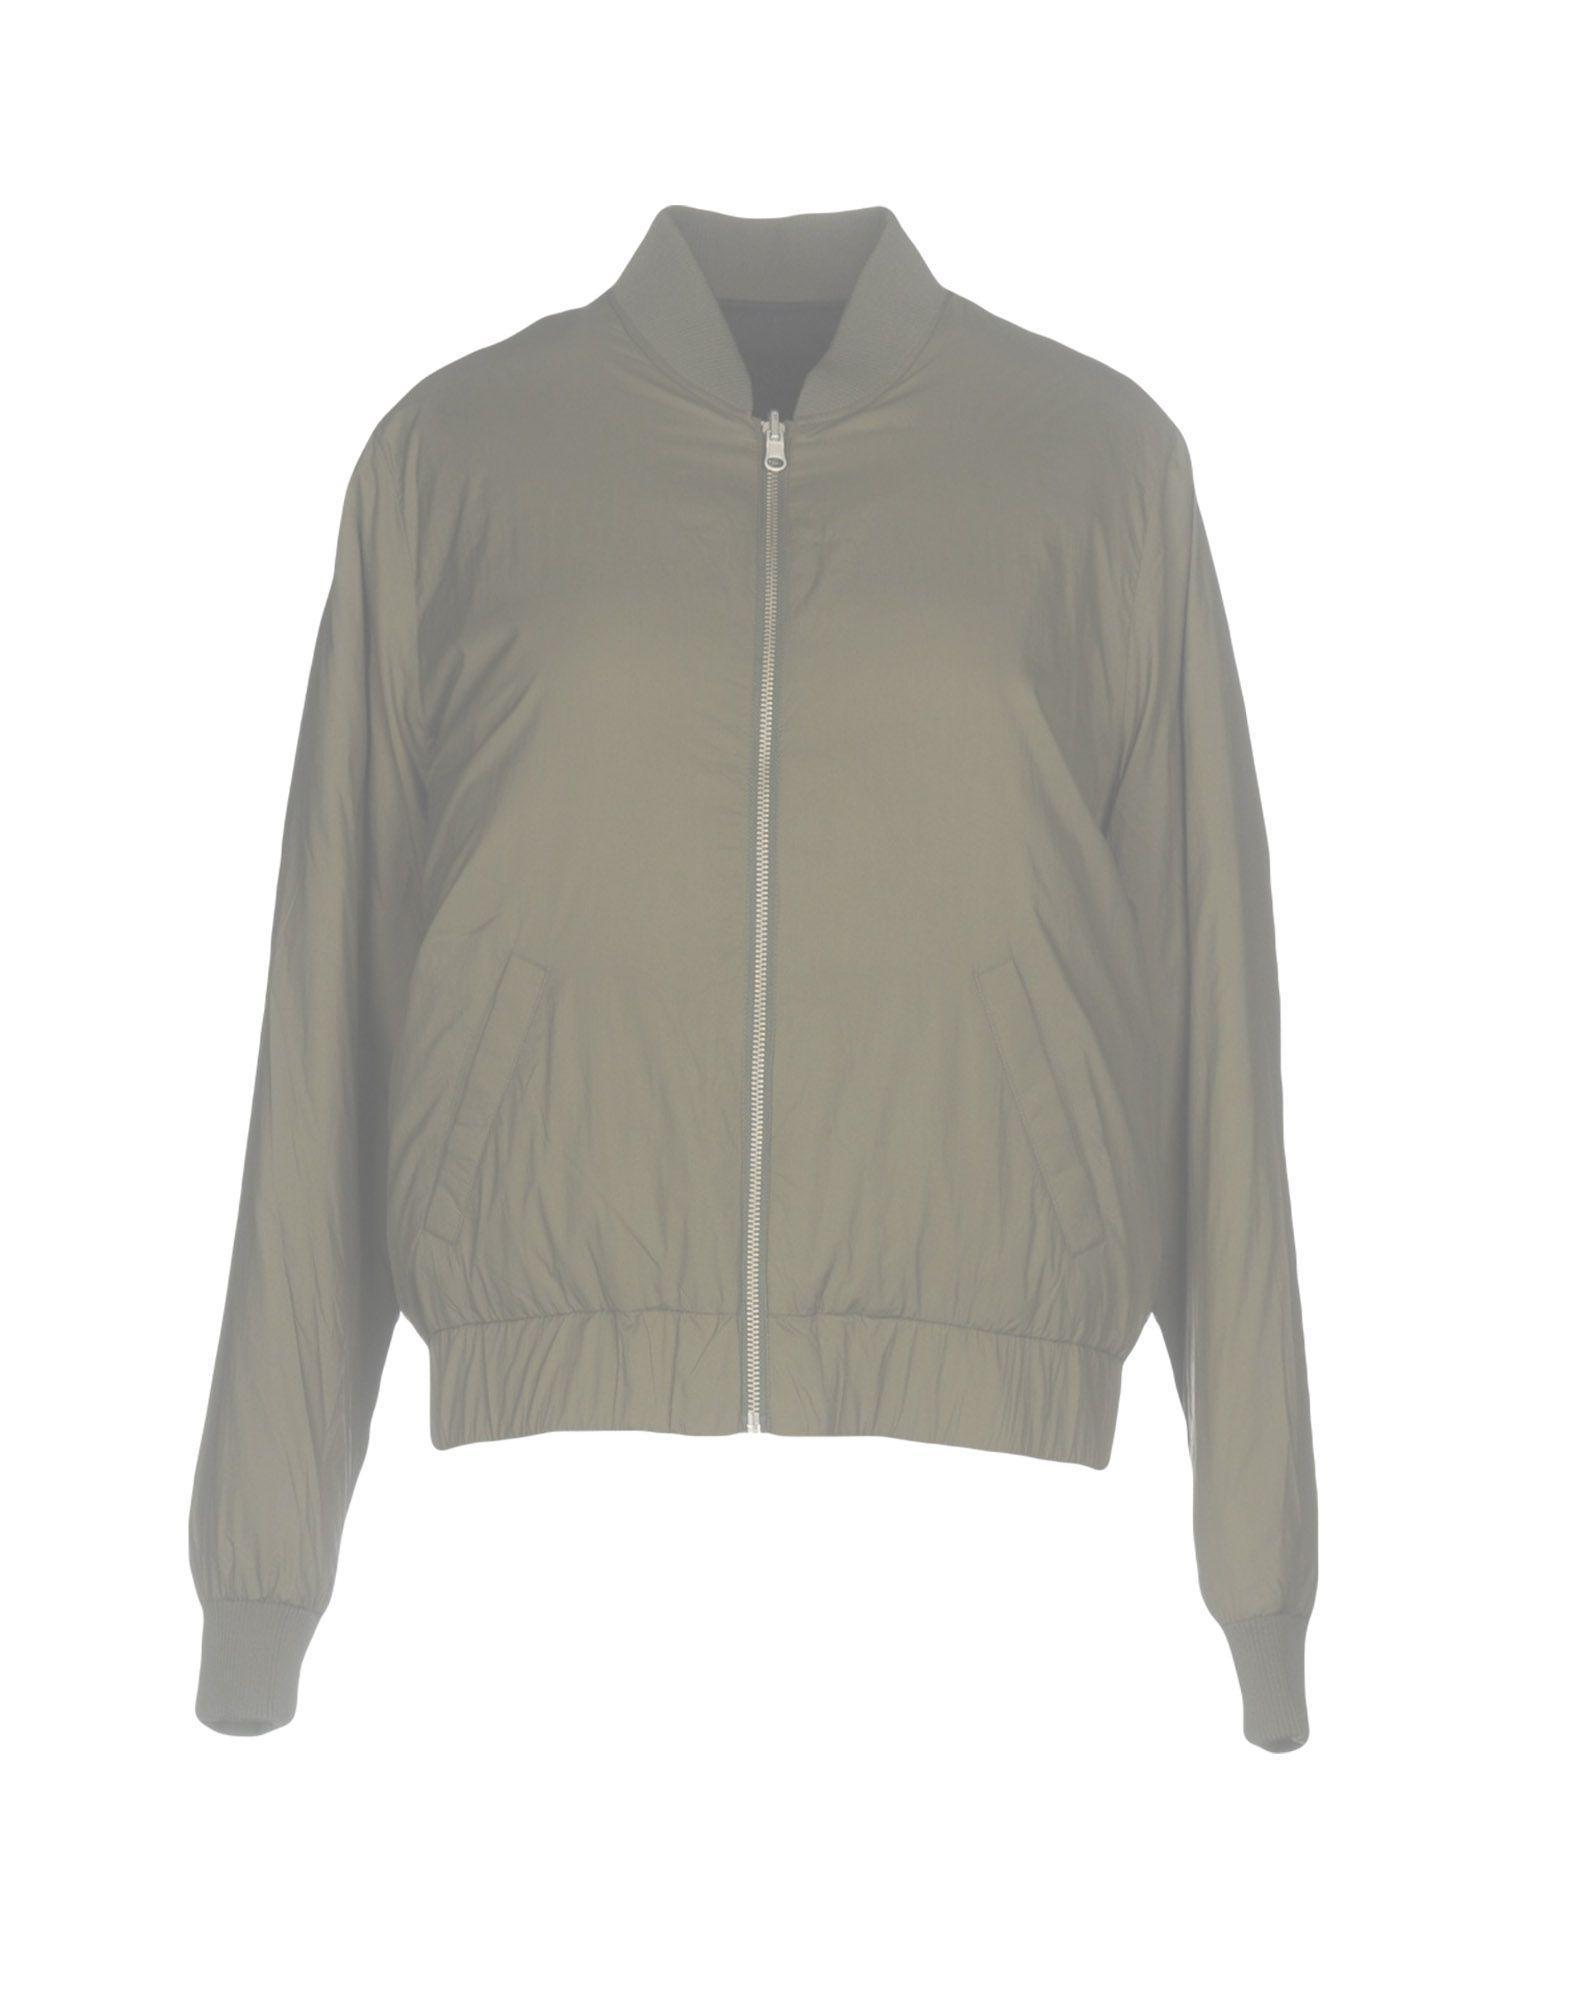 Denham Down Jackets In Military Green